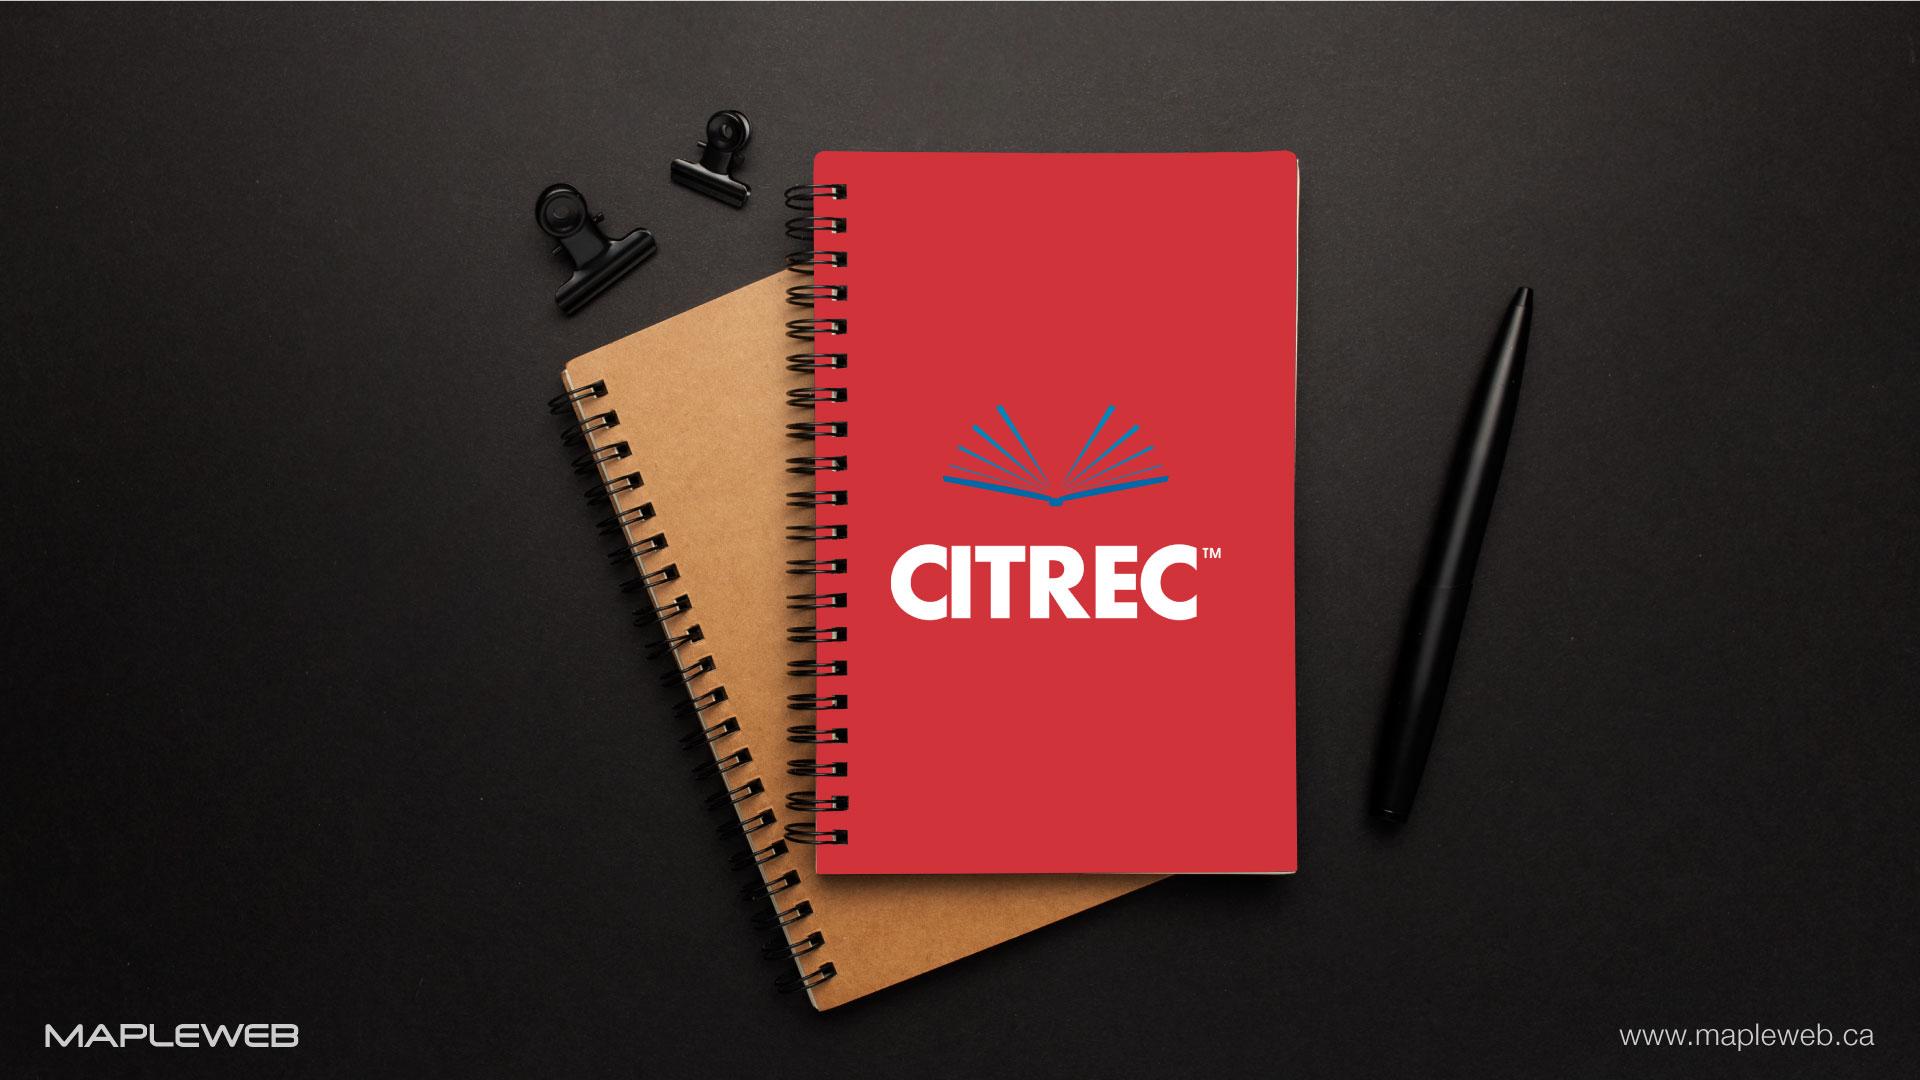 citrec-brand-logo-design-by-mapleweb-vancouver-canada-notebook-mock